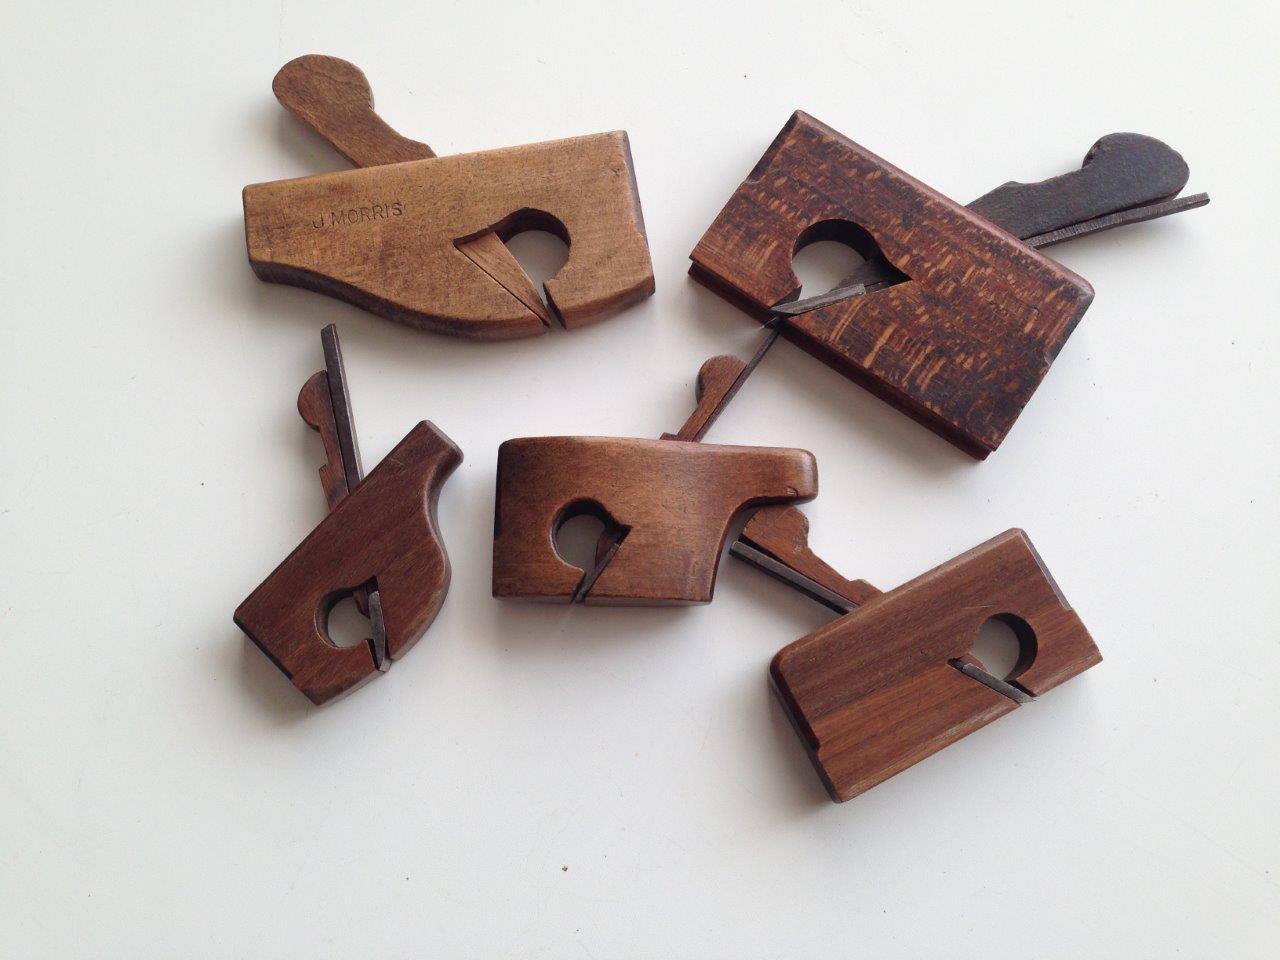 Minature Wooden Planes